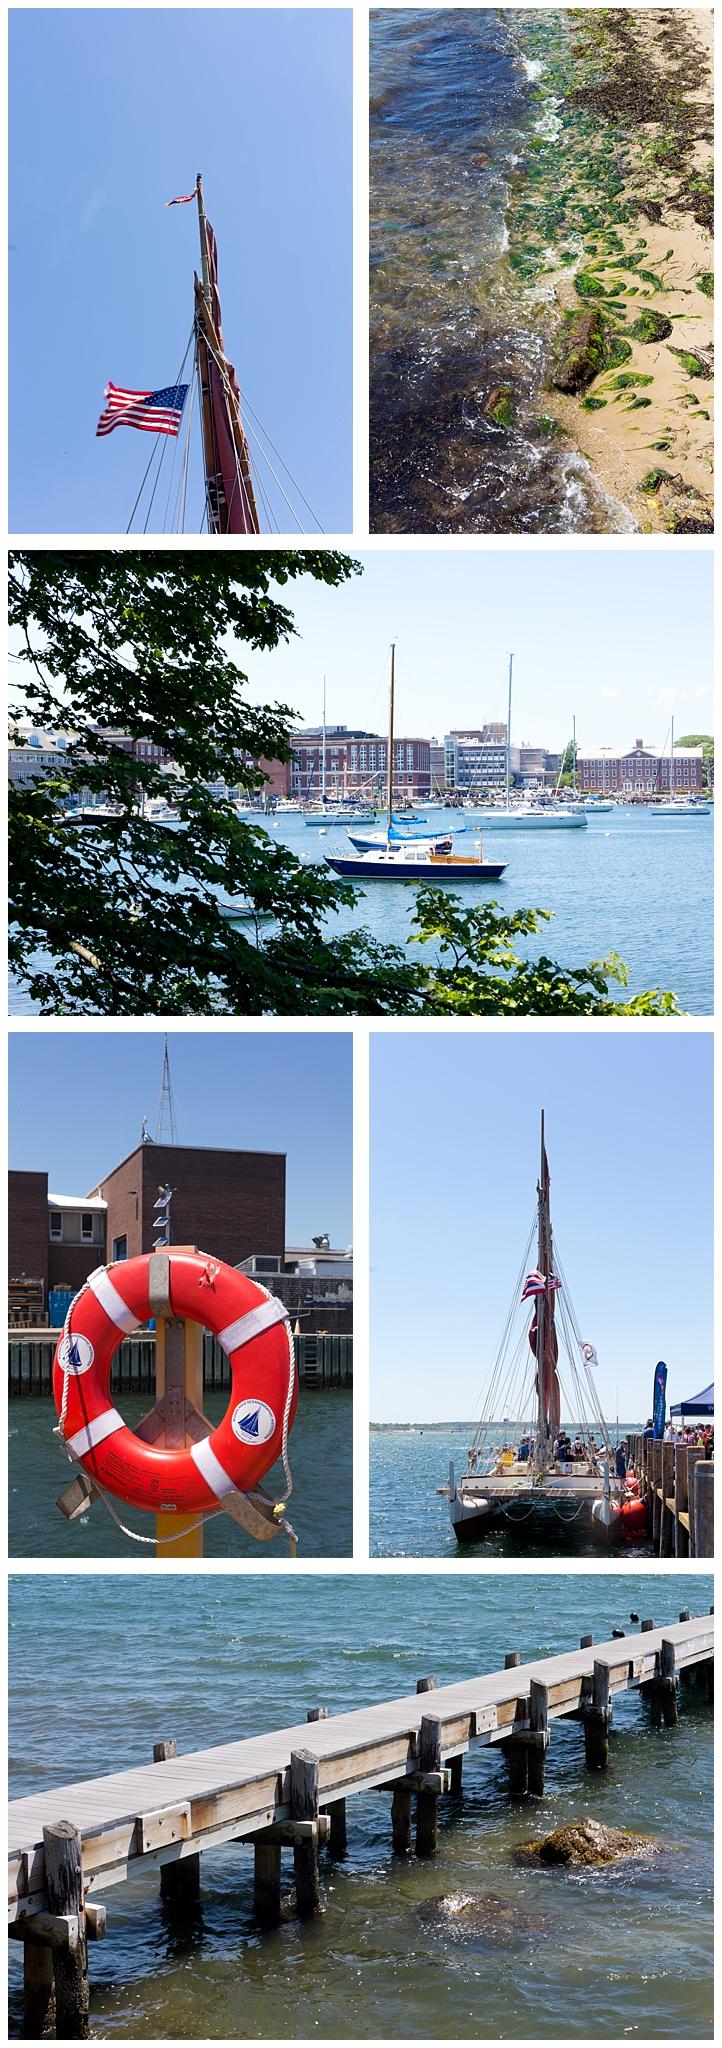 nautical fun in Woods Hole, Massachusetts (boats, pier on Cape Cod)